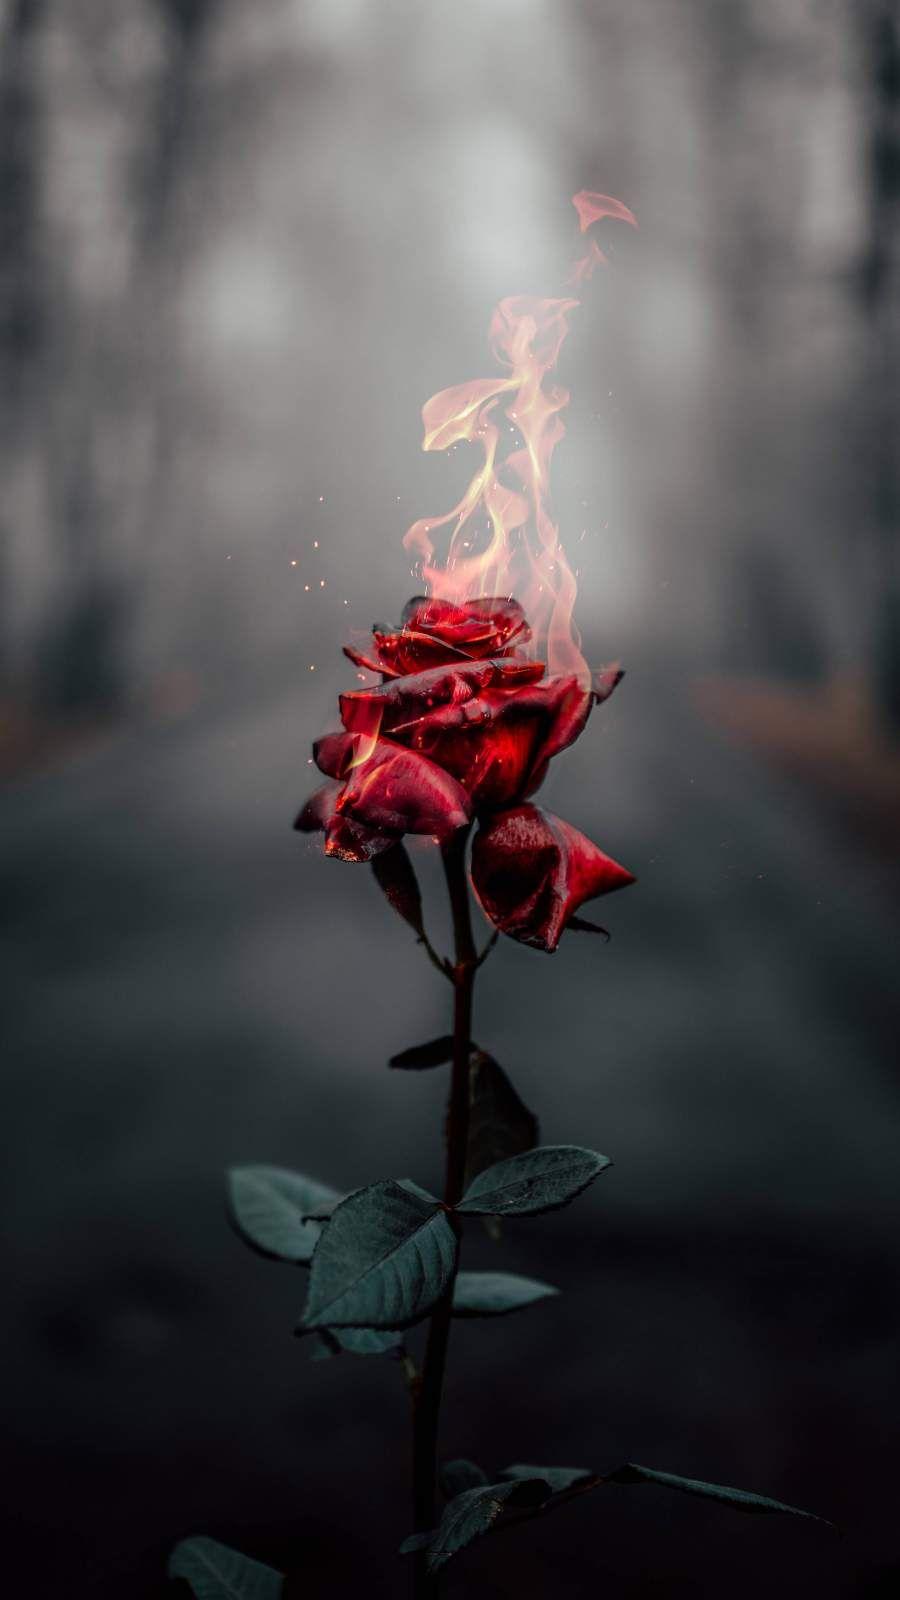 Burning Rose Iphone Wallpaper Nature Photography Photography Wallpaper Fire Photography